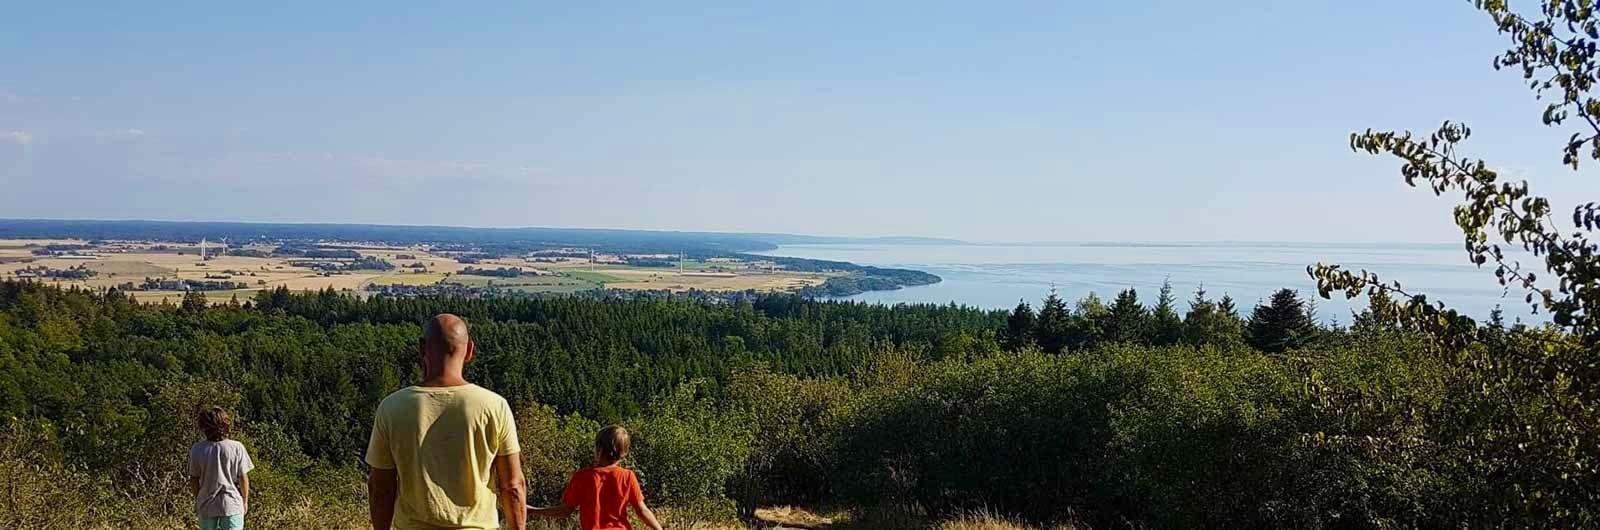 Signature Trail Omberg Swedish Tourist Association